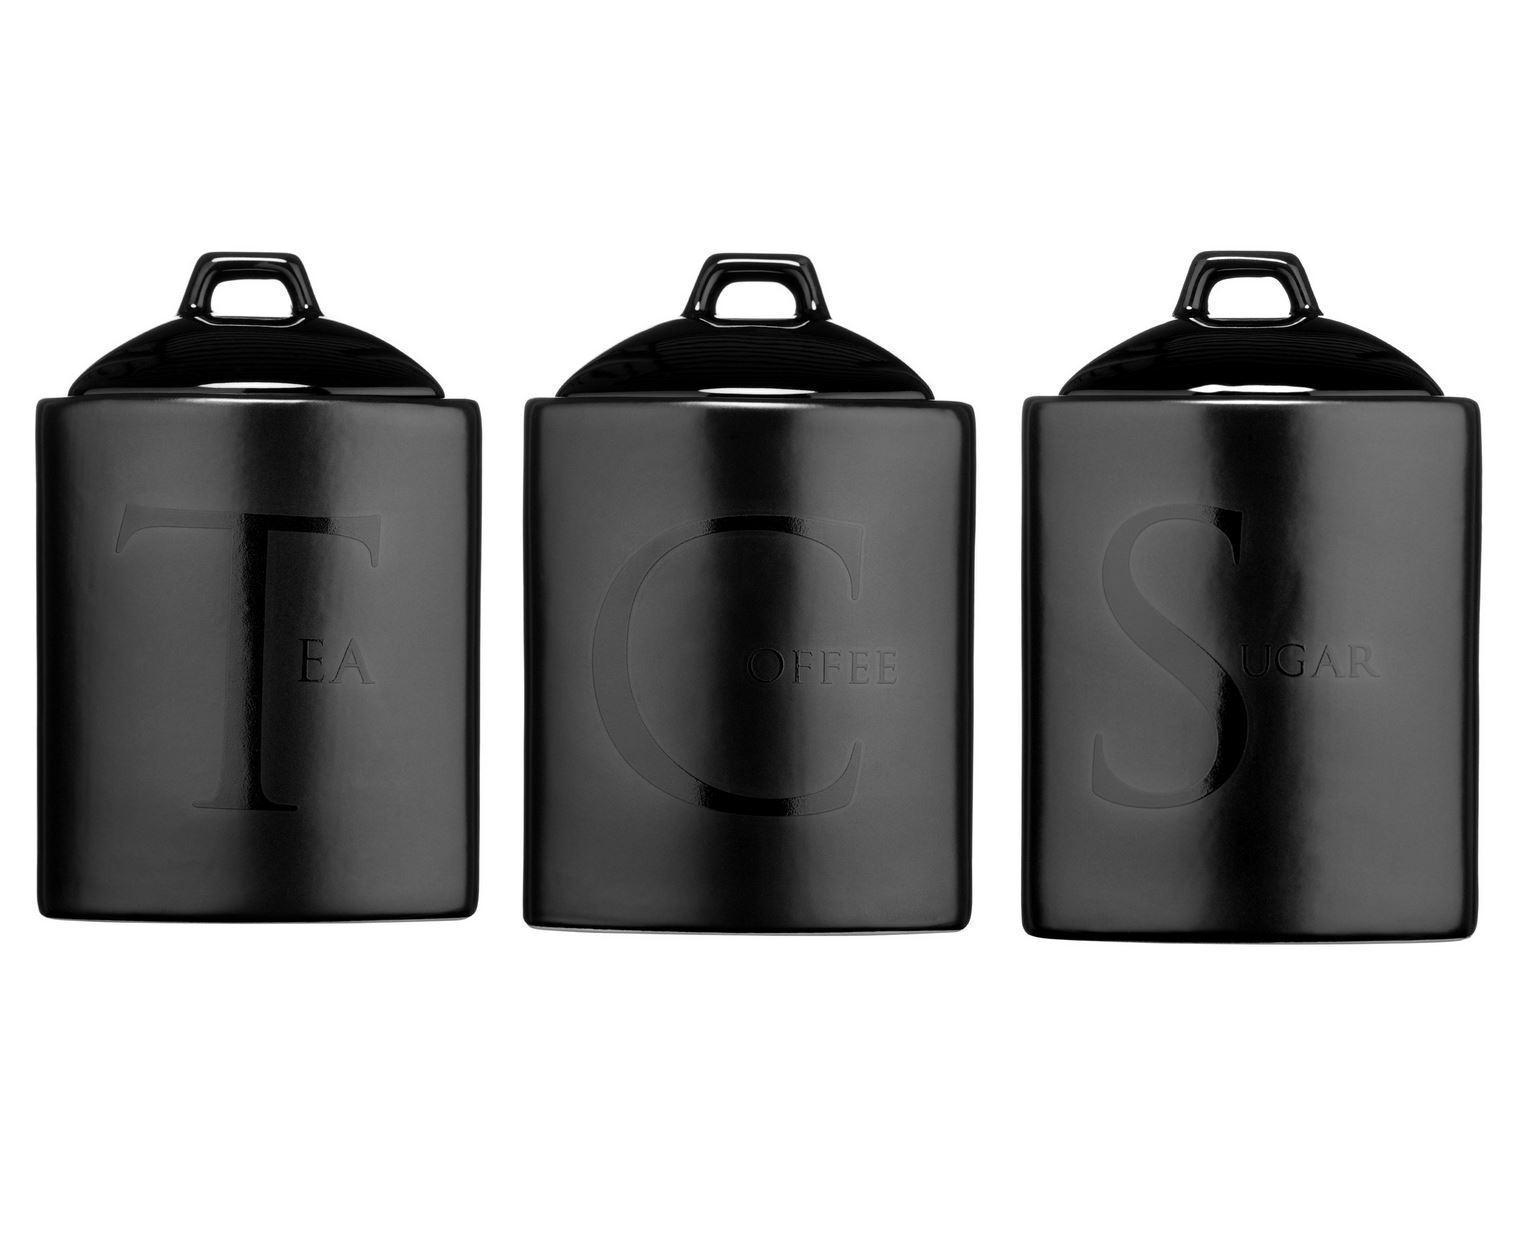 kitchen storage canisters home depot sinks undermount ceramic tea coffee sugar jars